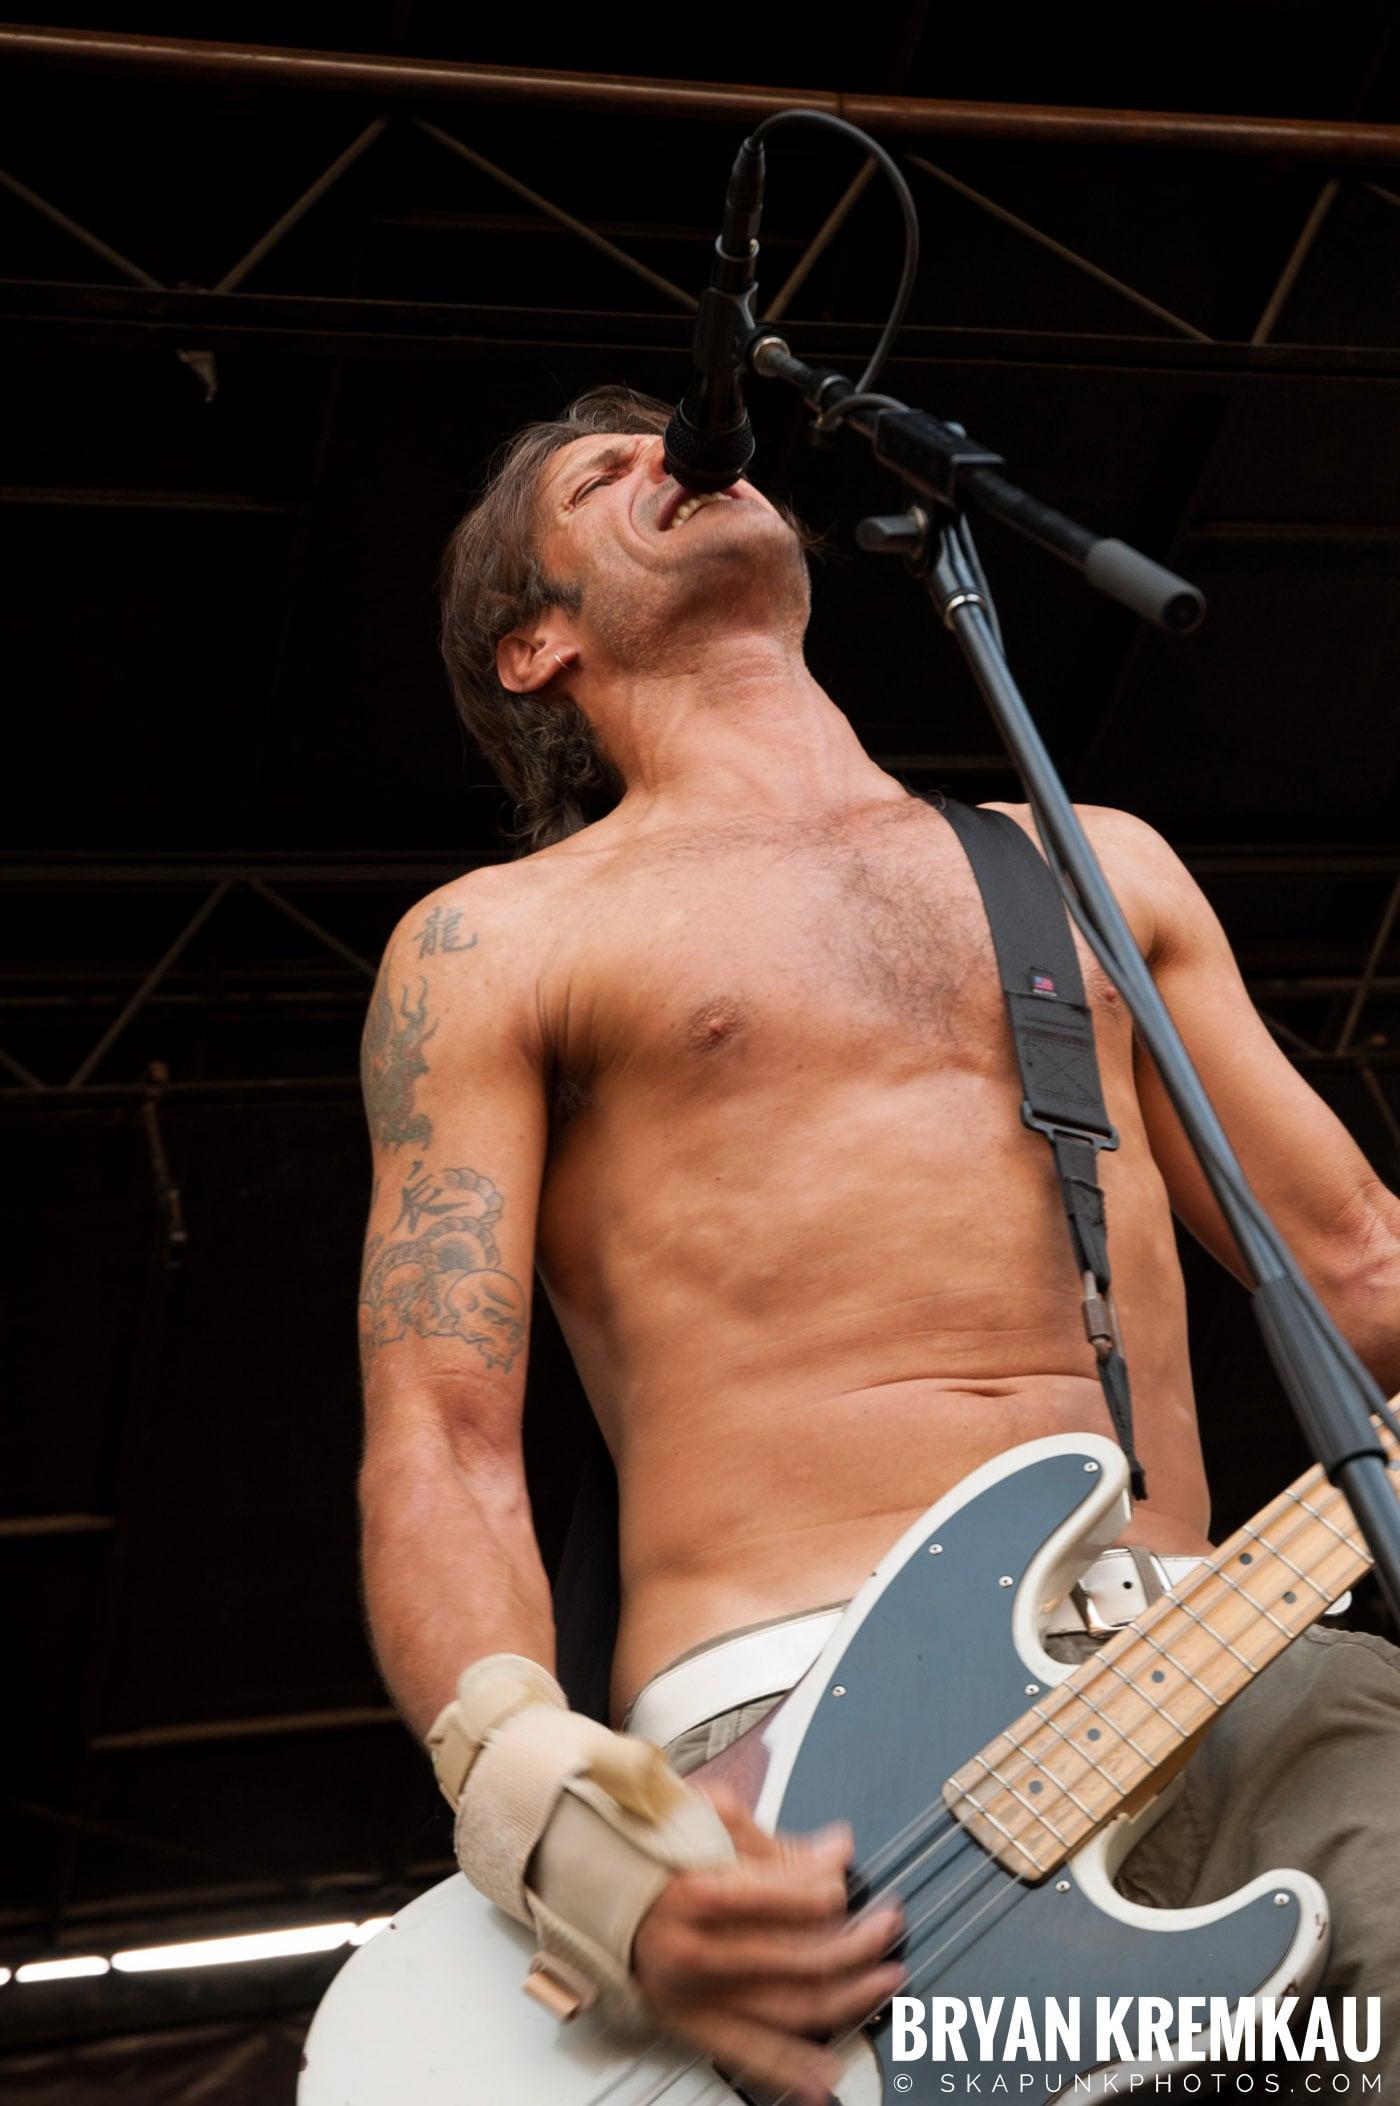 Bad Religion @ Warped Tour 2007, Scranton PA - 7.26.07 (7)